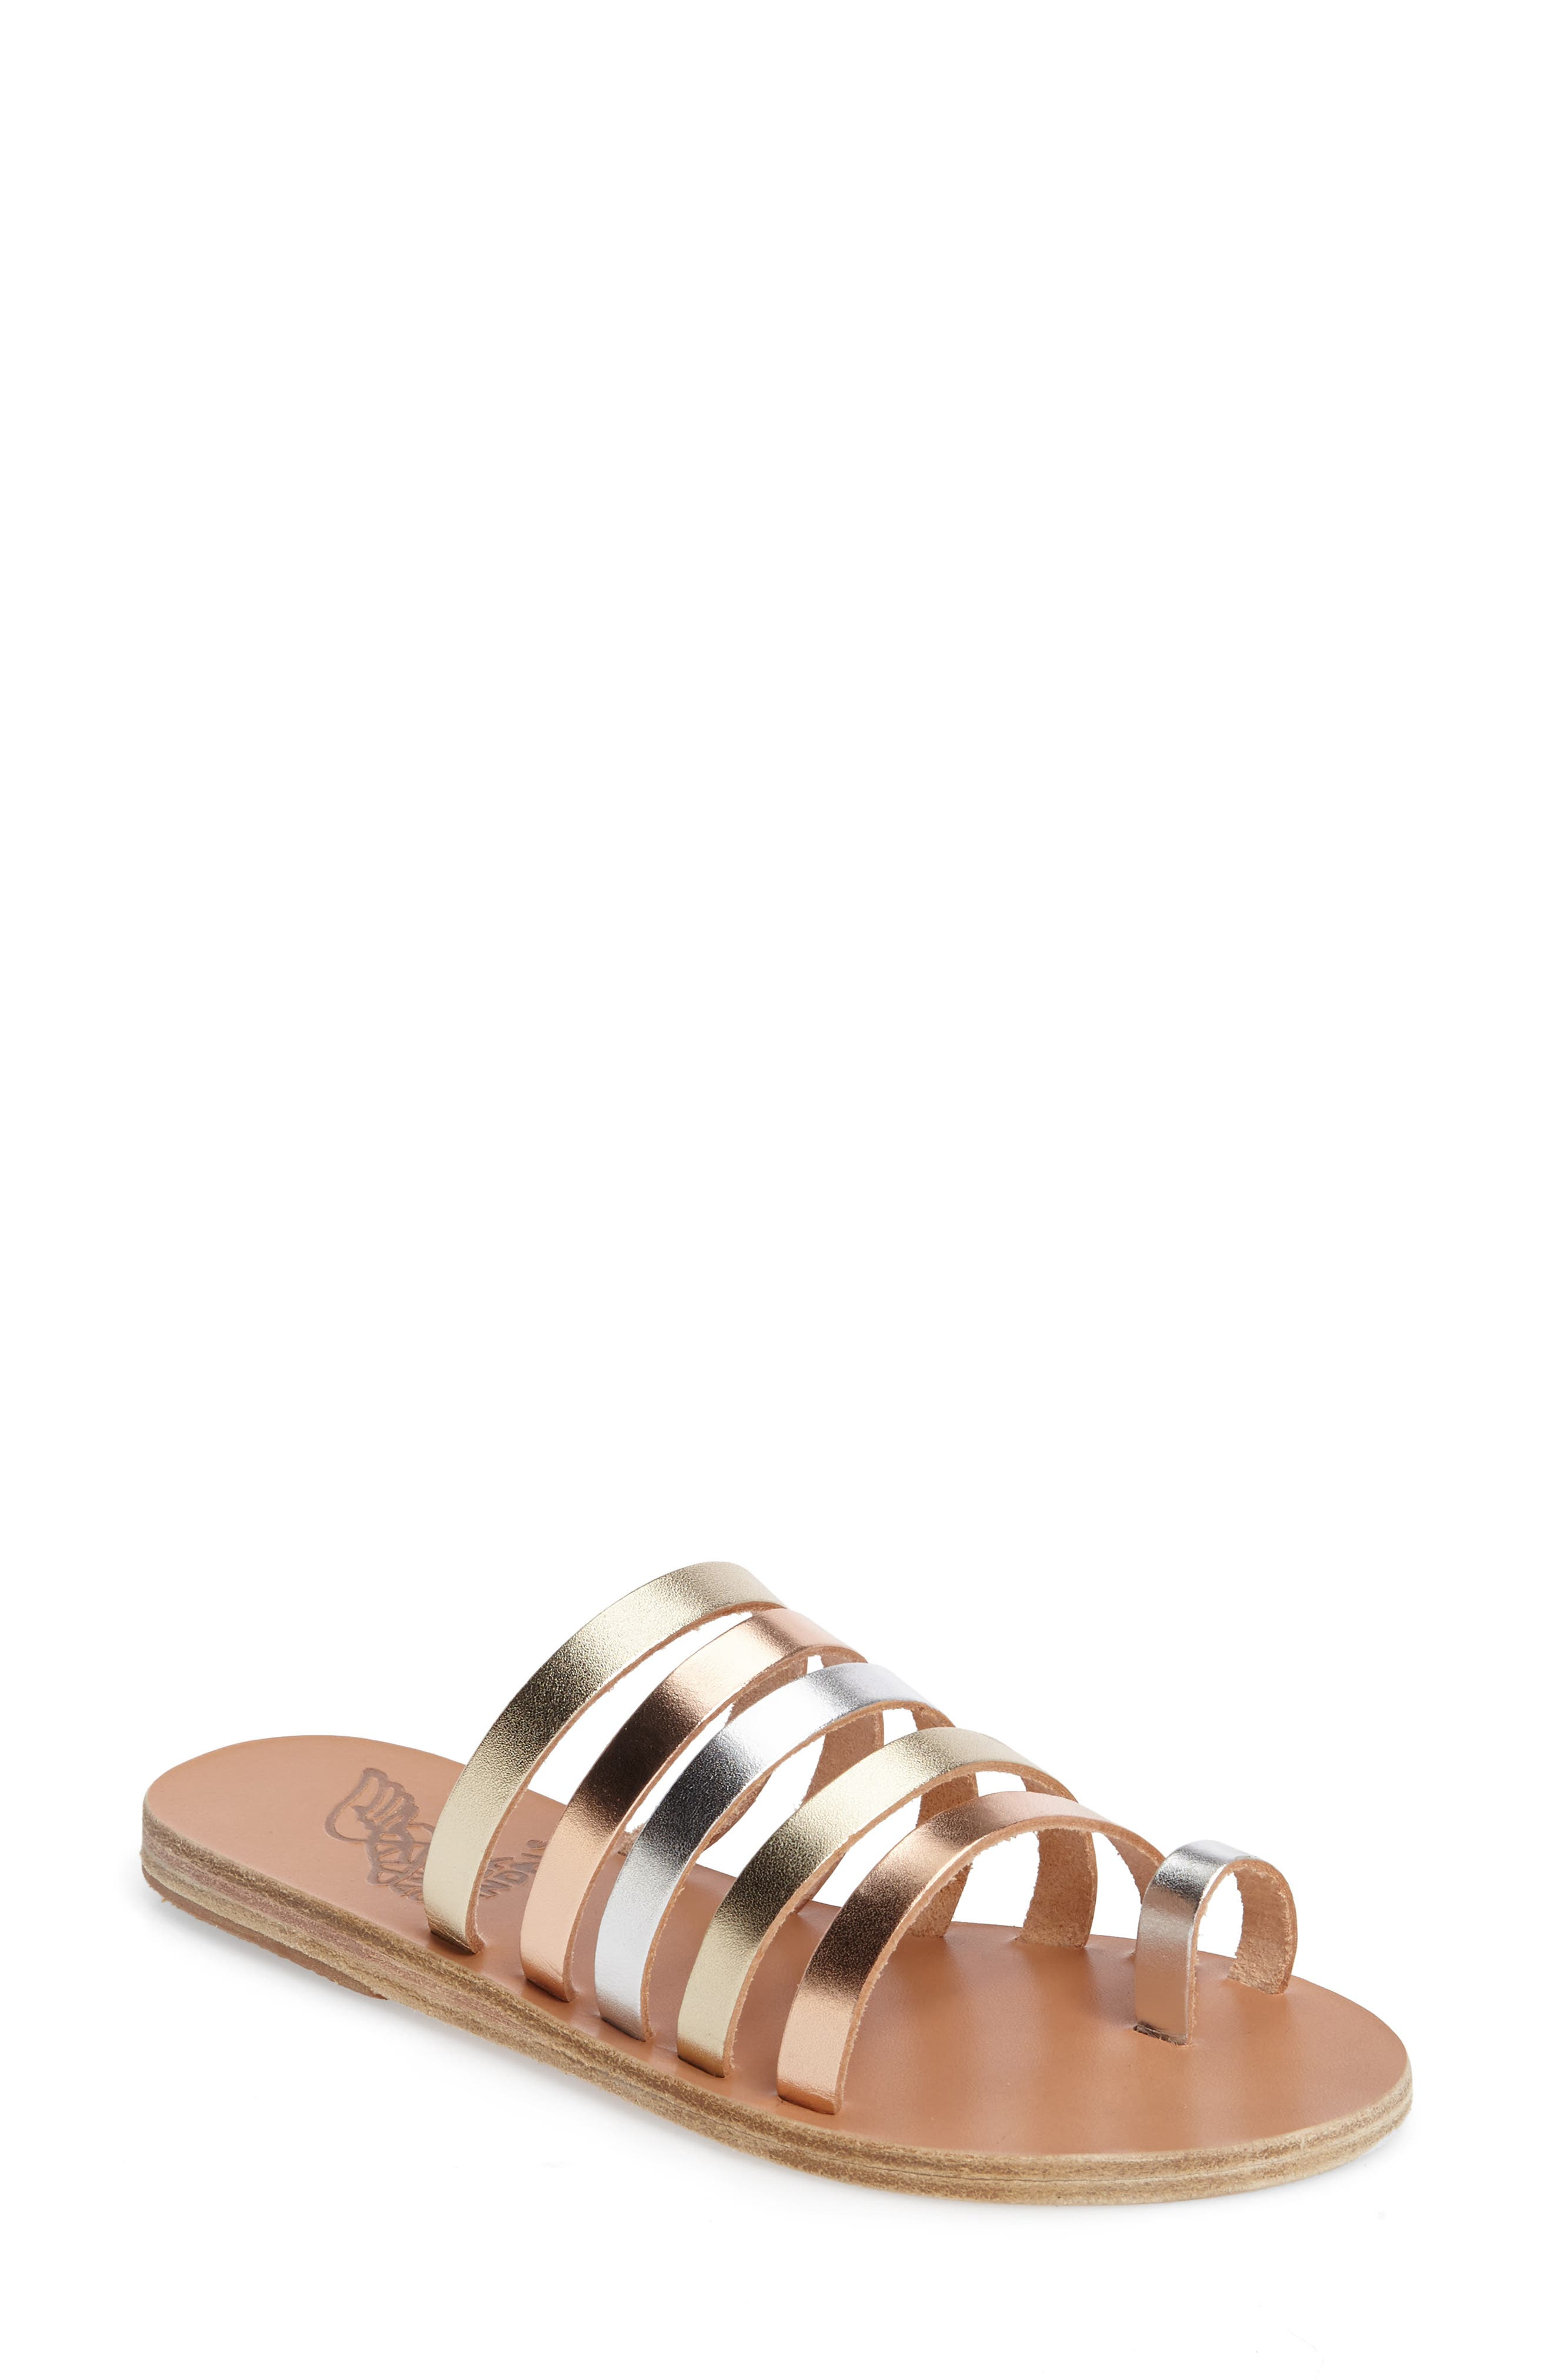 ANCIENT GREEK SANDALS Niki Slide Sandal, Main, color, METALLIC MIX